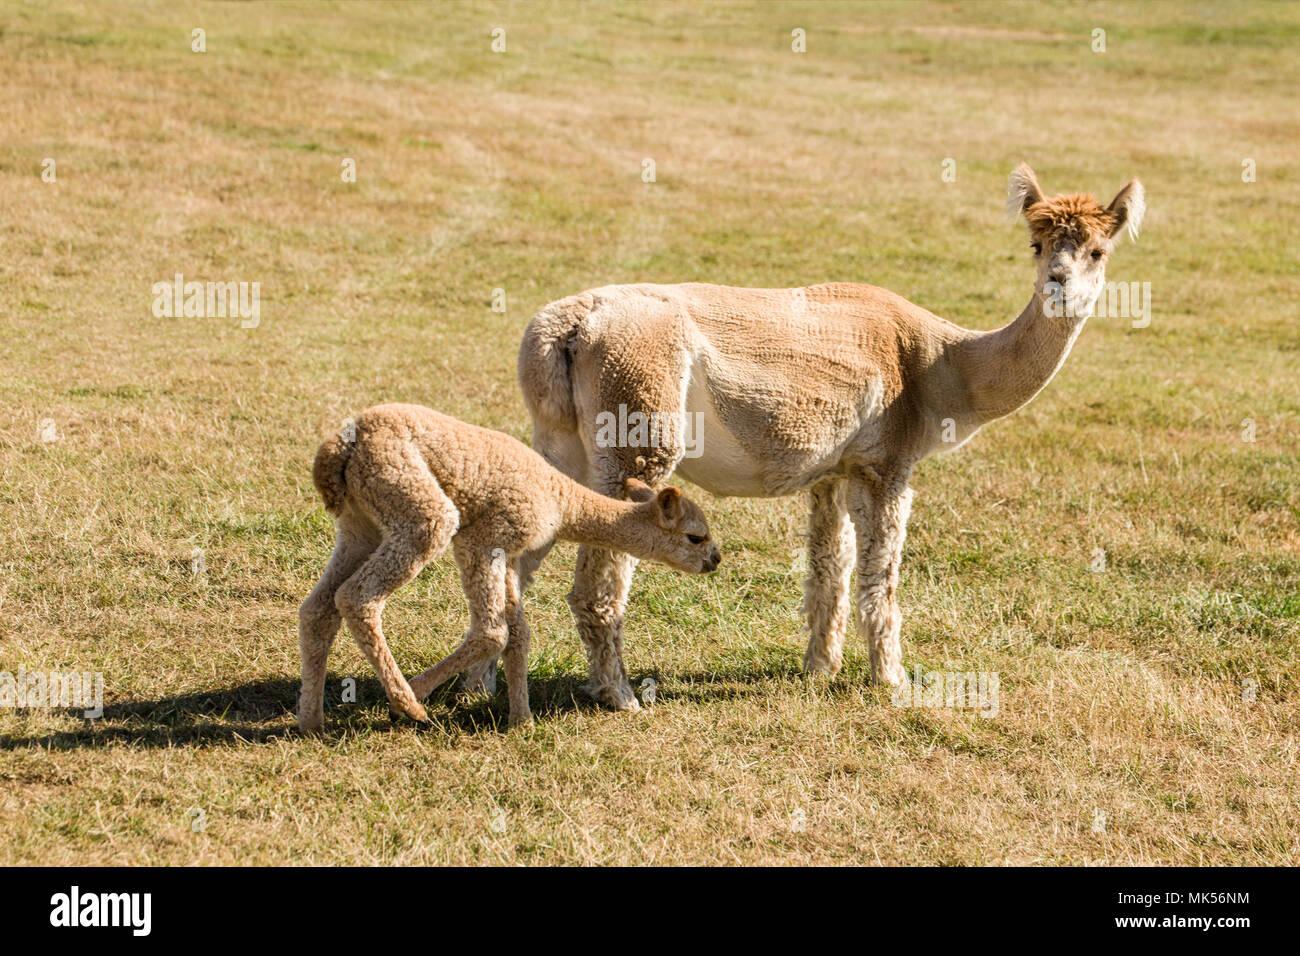 San Juan Islands, Washington, USA.  Freshly sheared mother and baby alpacas. - Stock Image